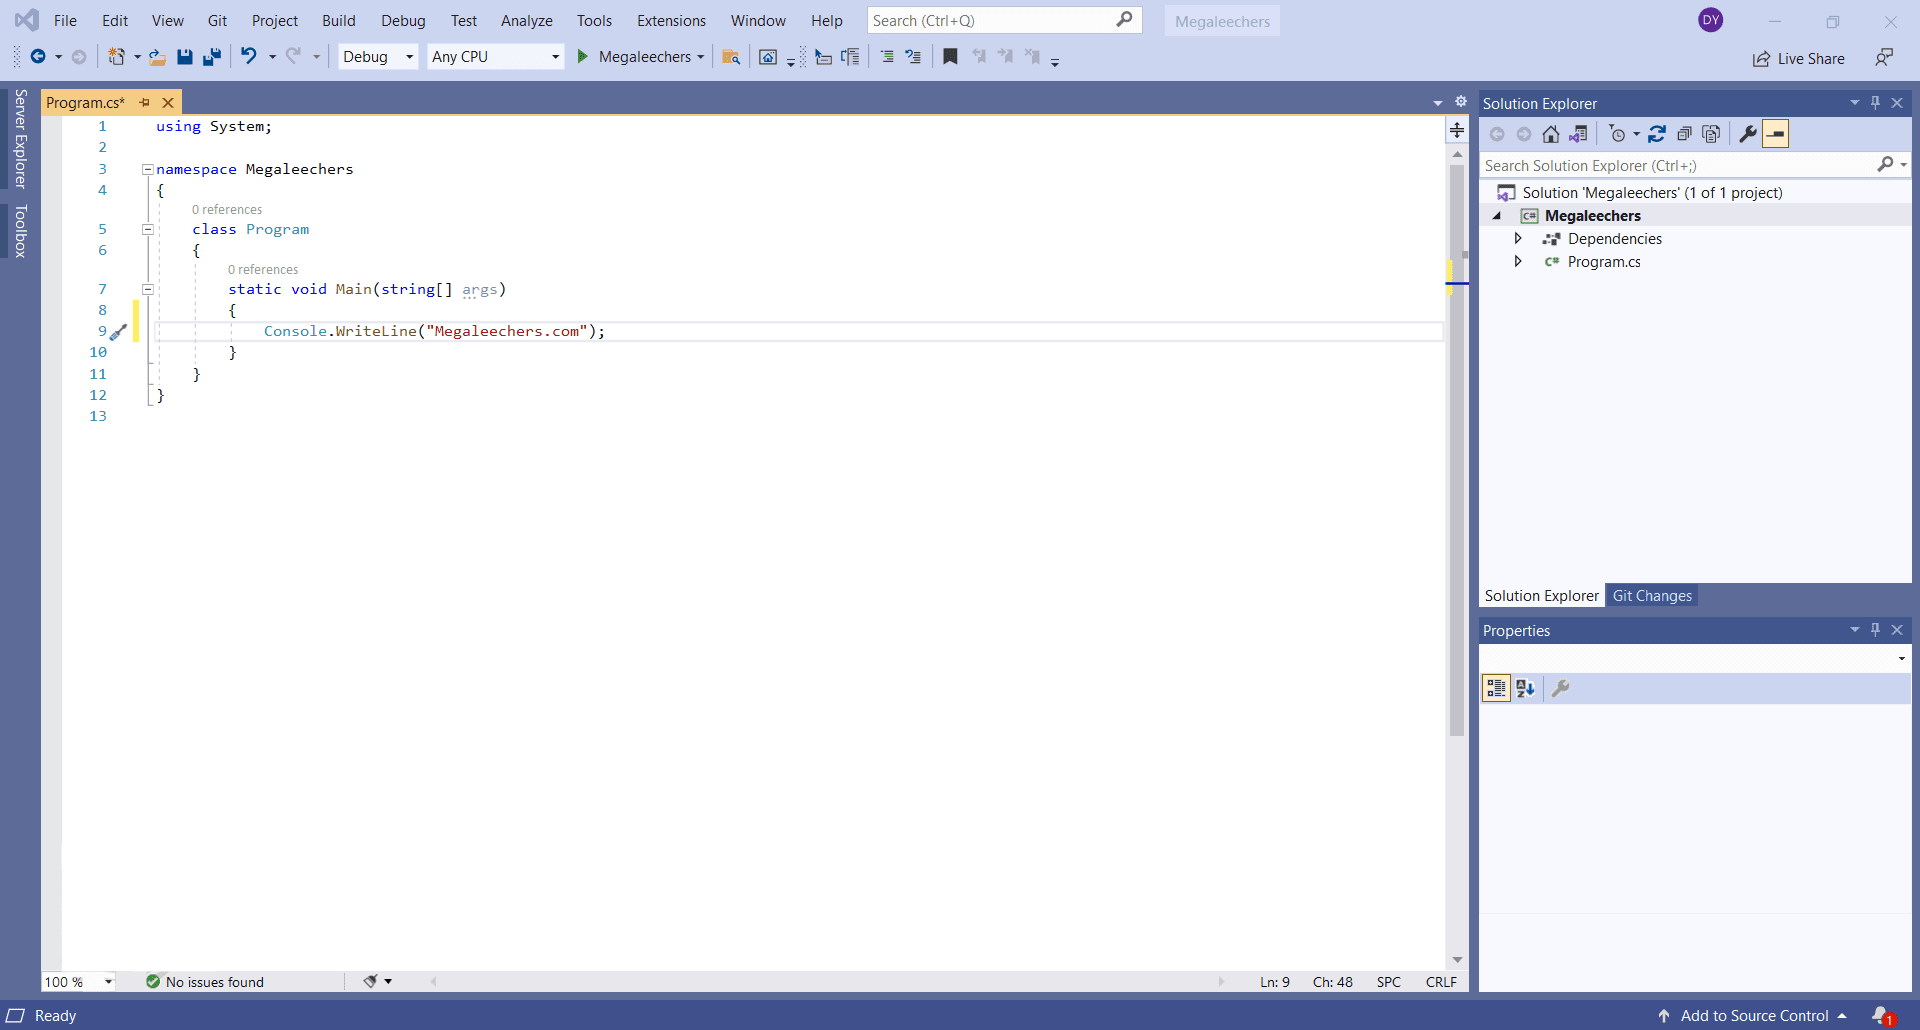 Visual Studio 2019 For Windows Main Interface Screenshot